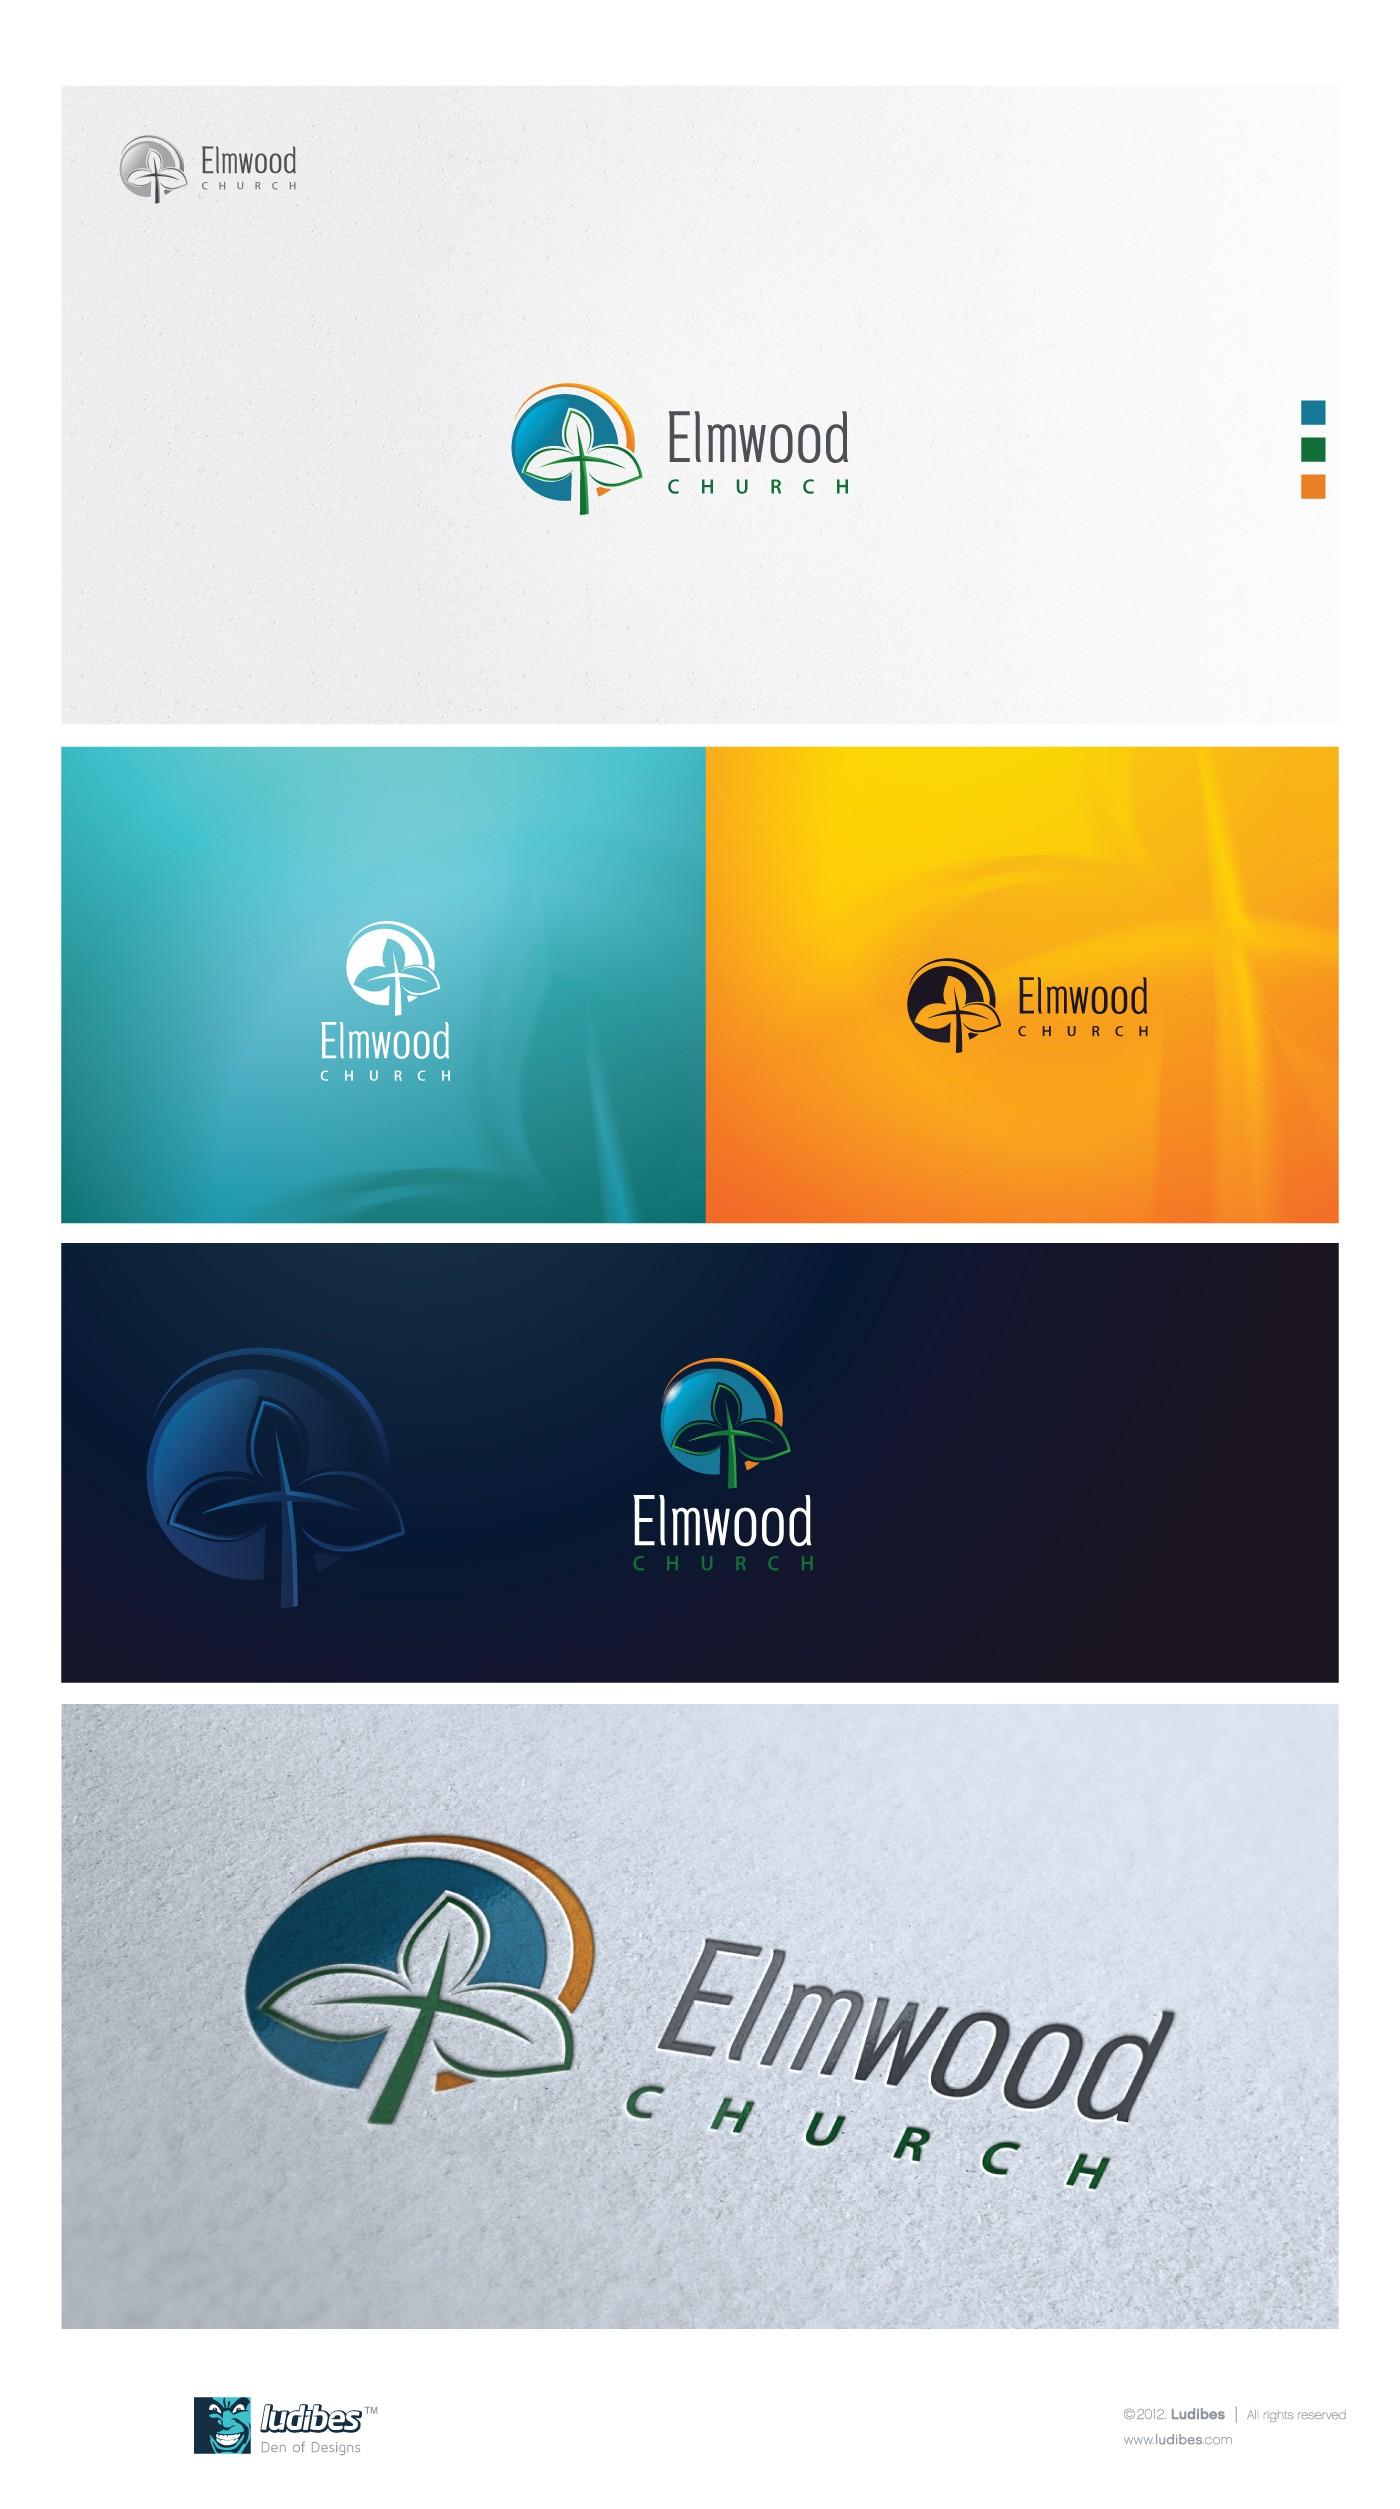 Help Elmwood Church with a new logo